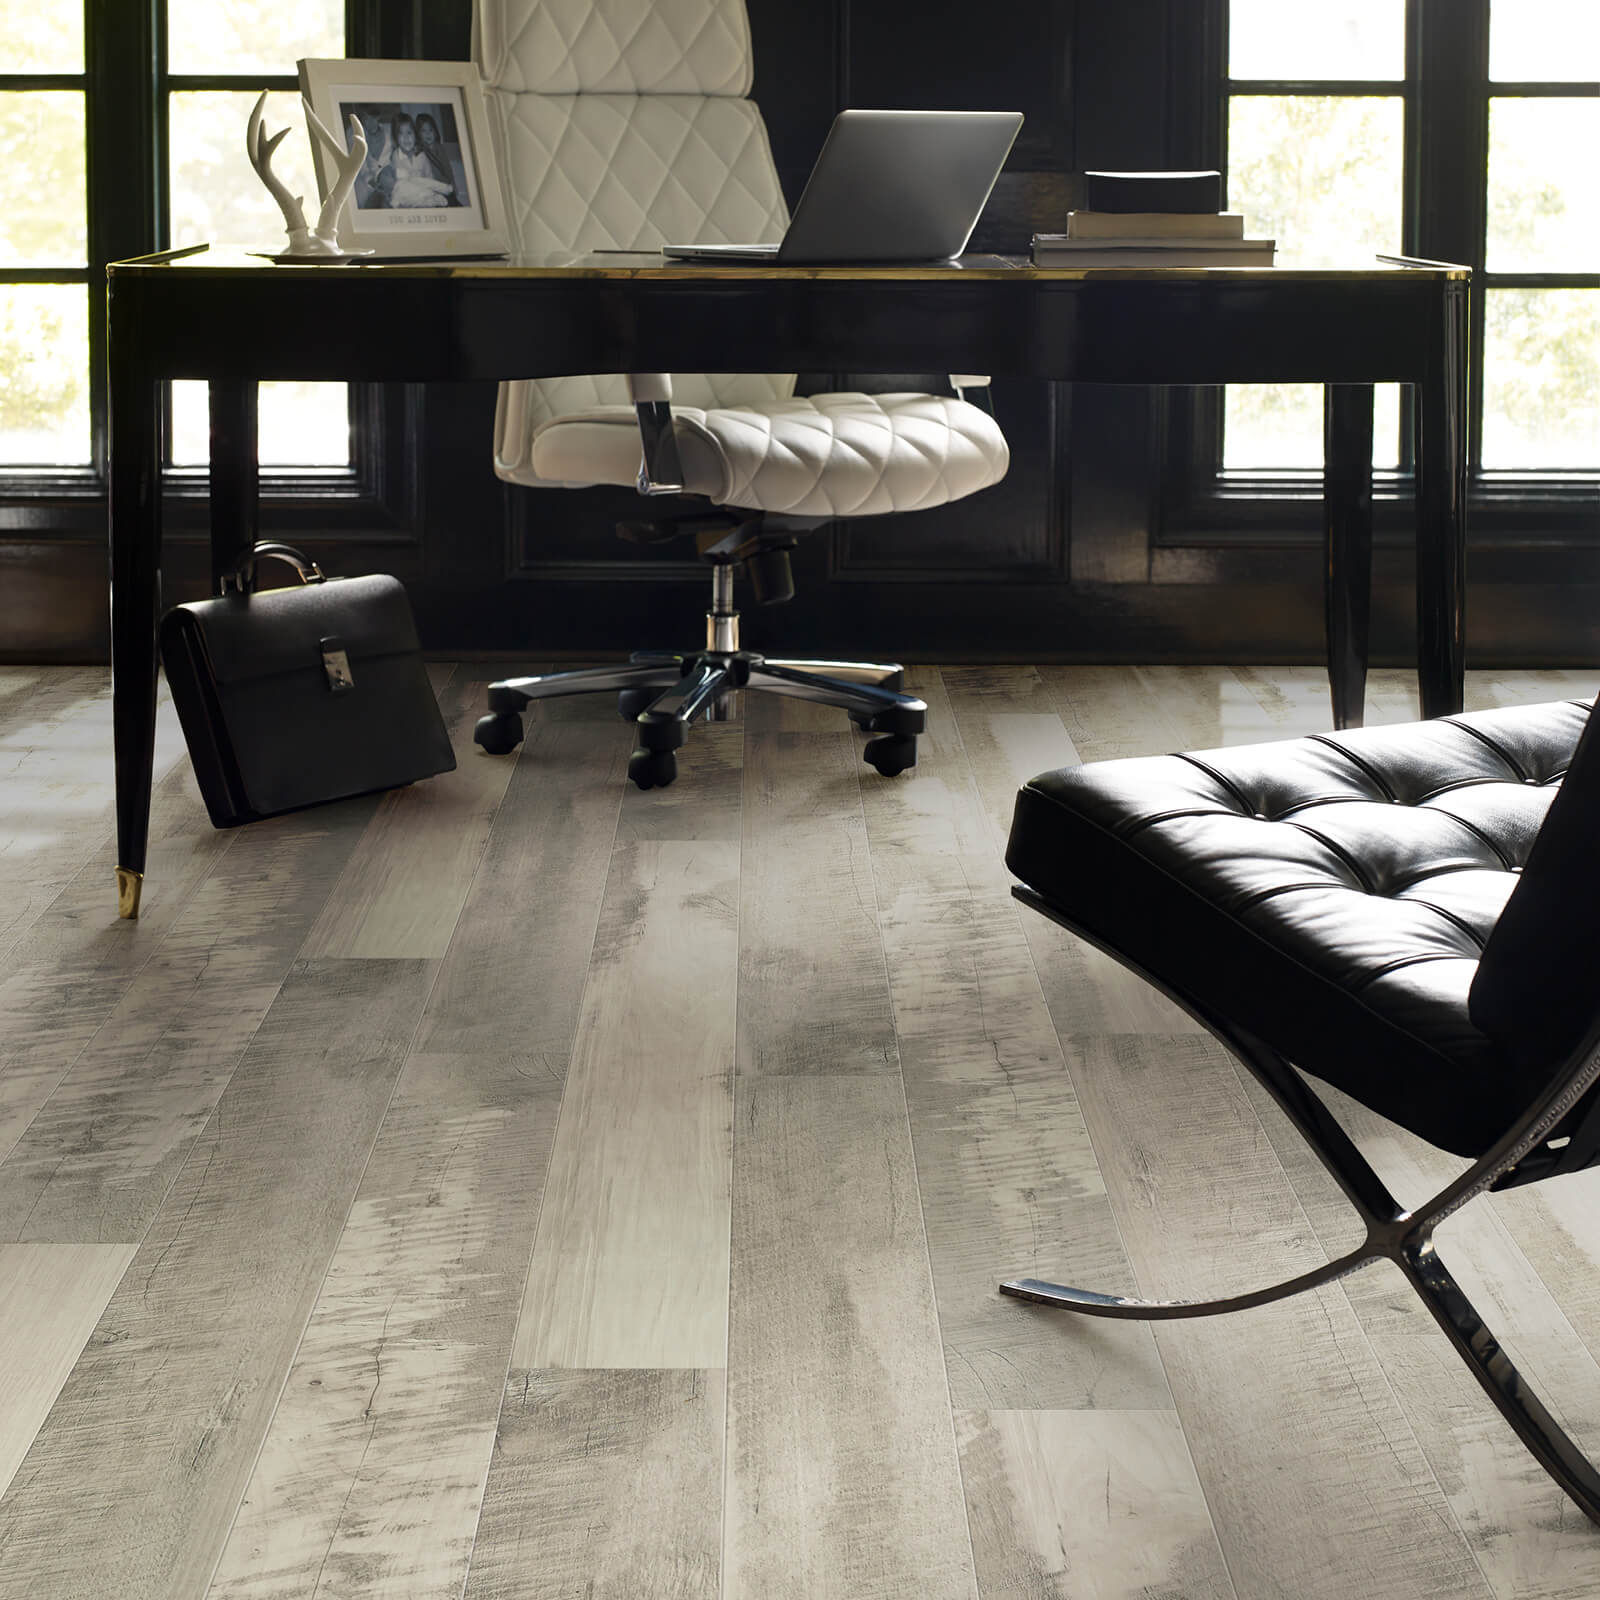 Tips to Design Your Home Office | Boyle's Floor & Window Designs